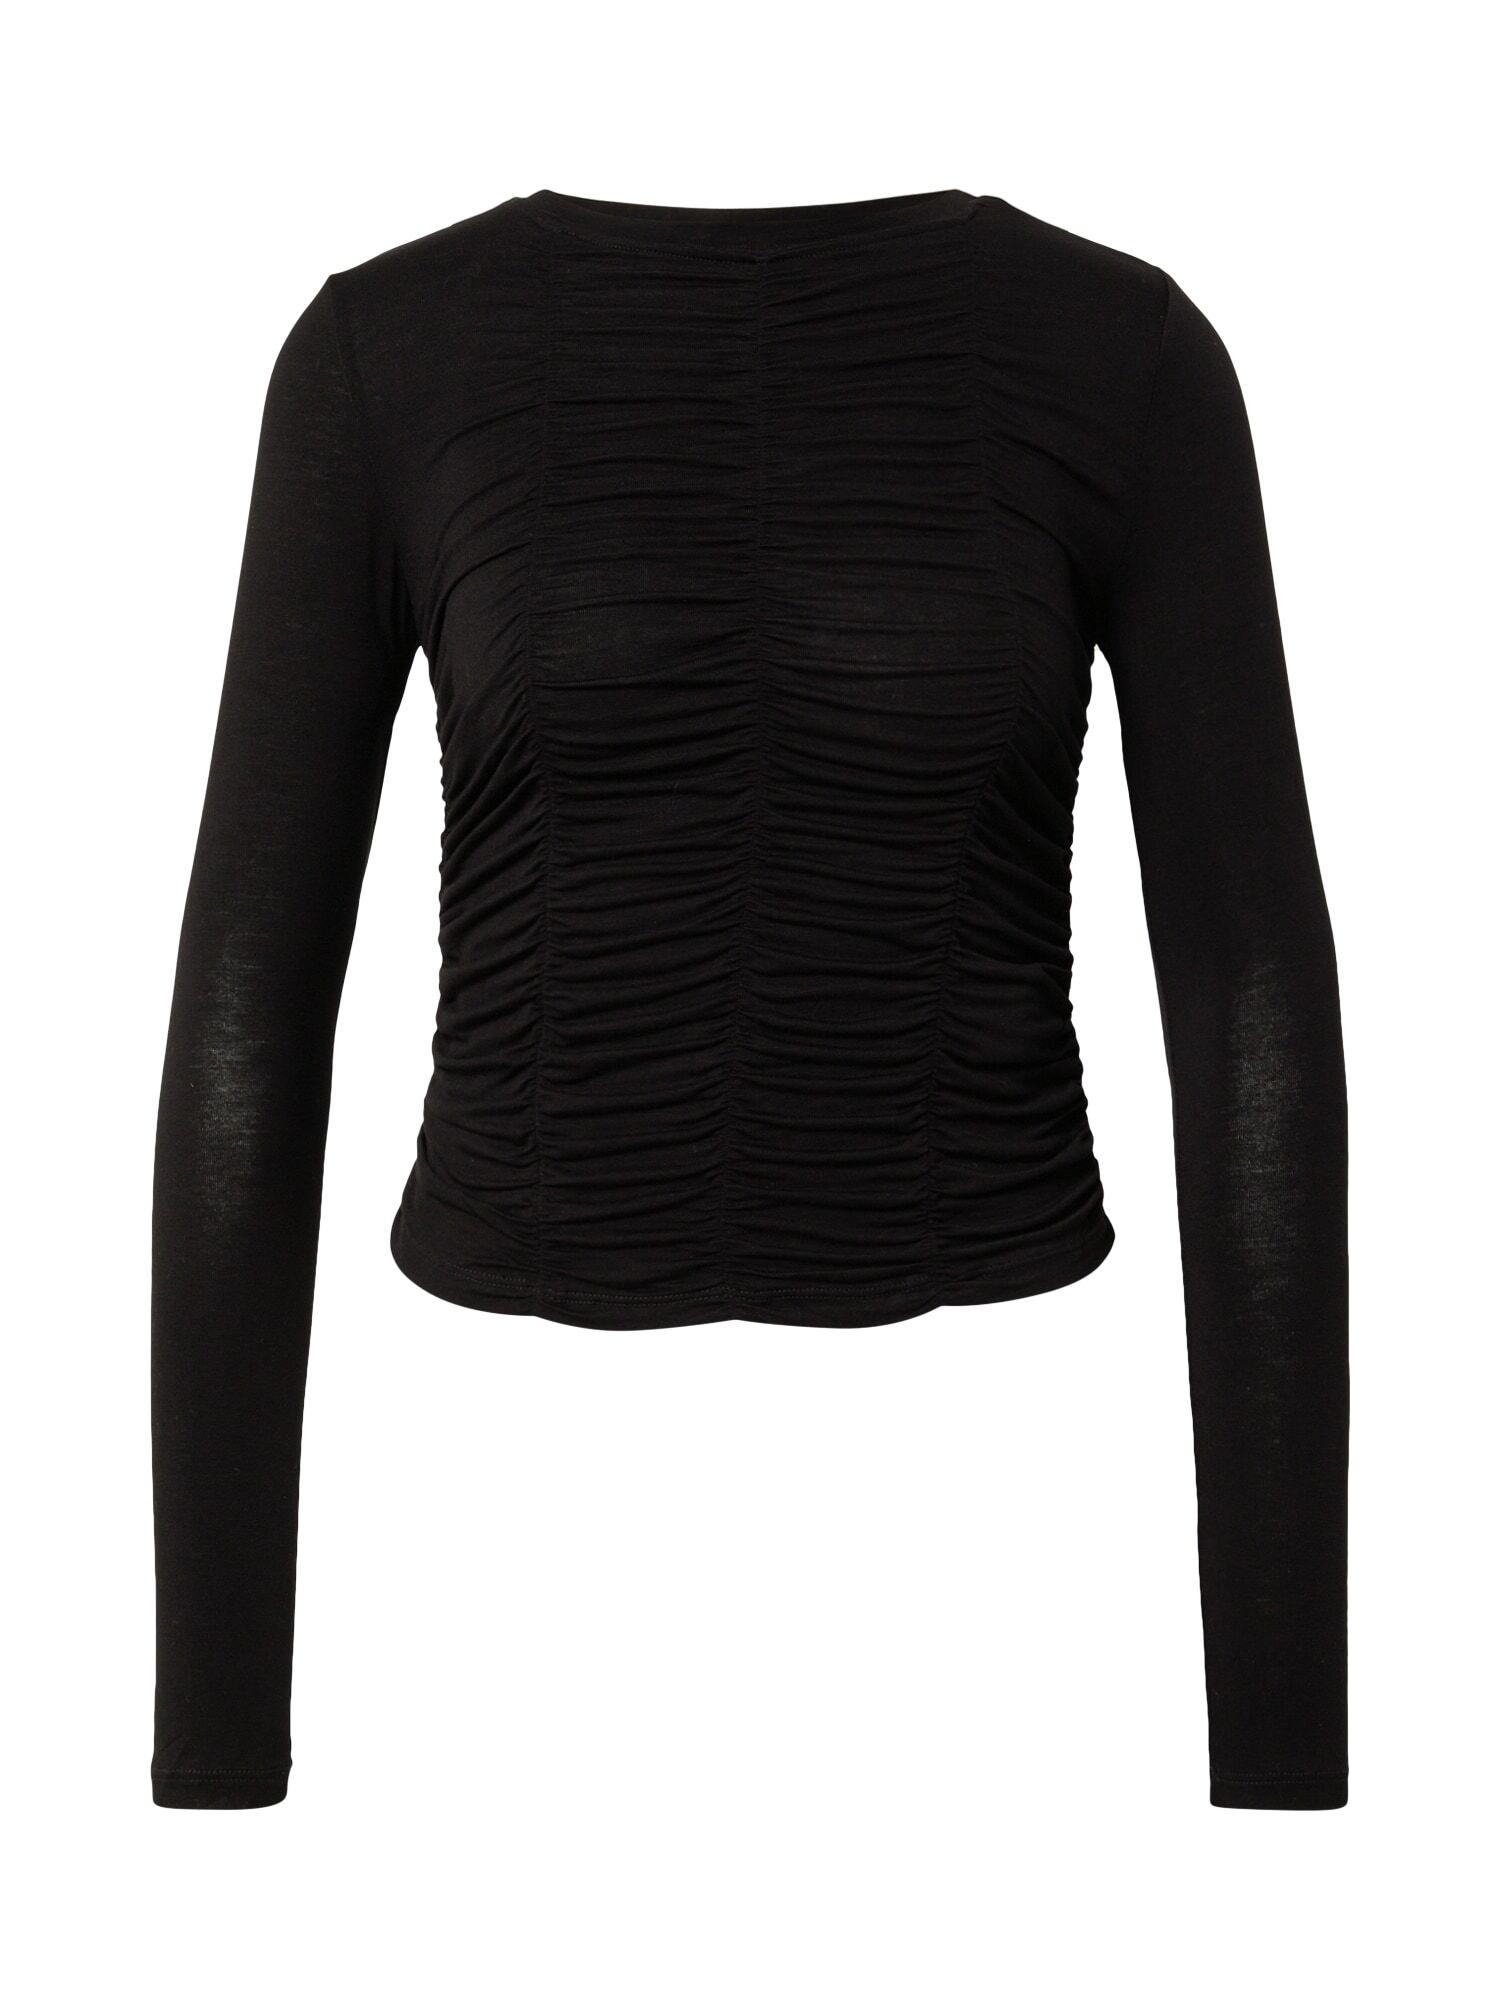 Gina Tricot Haut 'Catti'  - Noir - Taille: XS - female